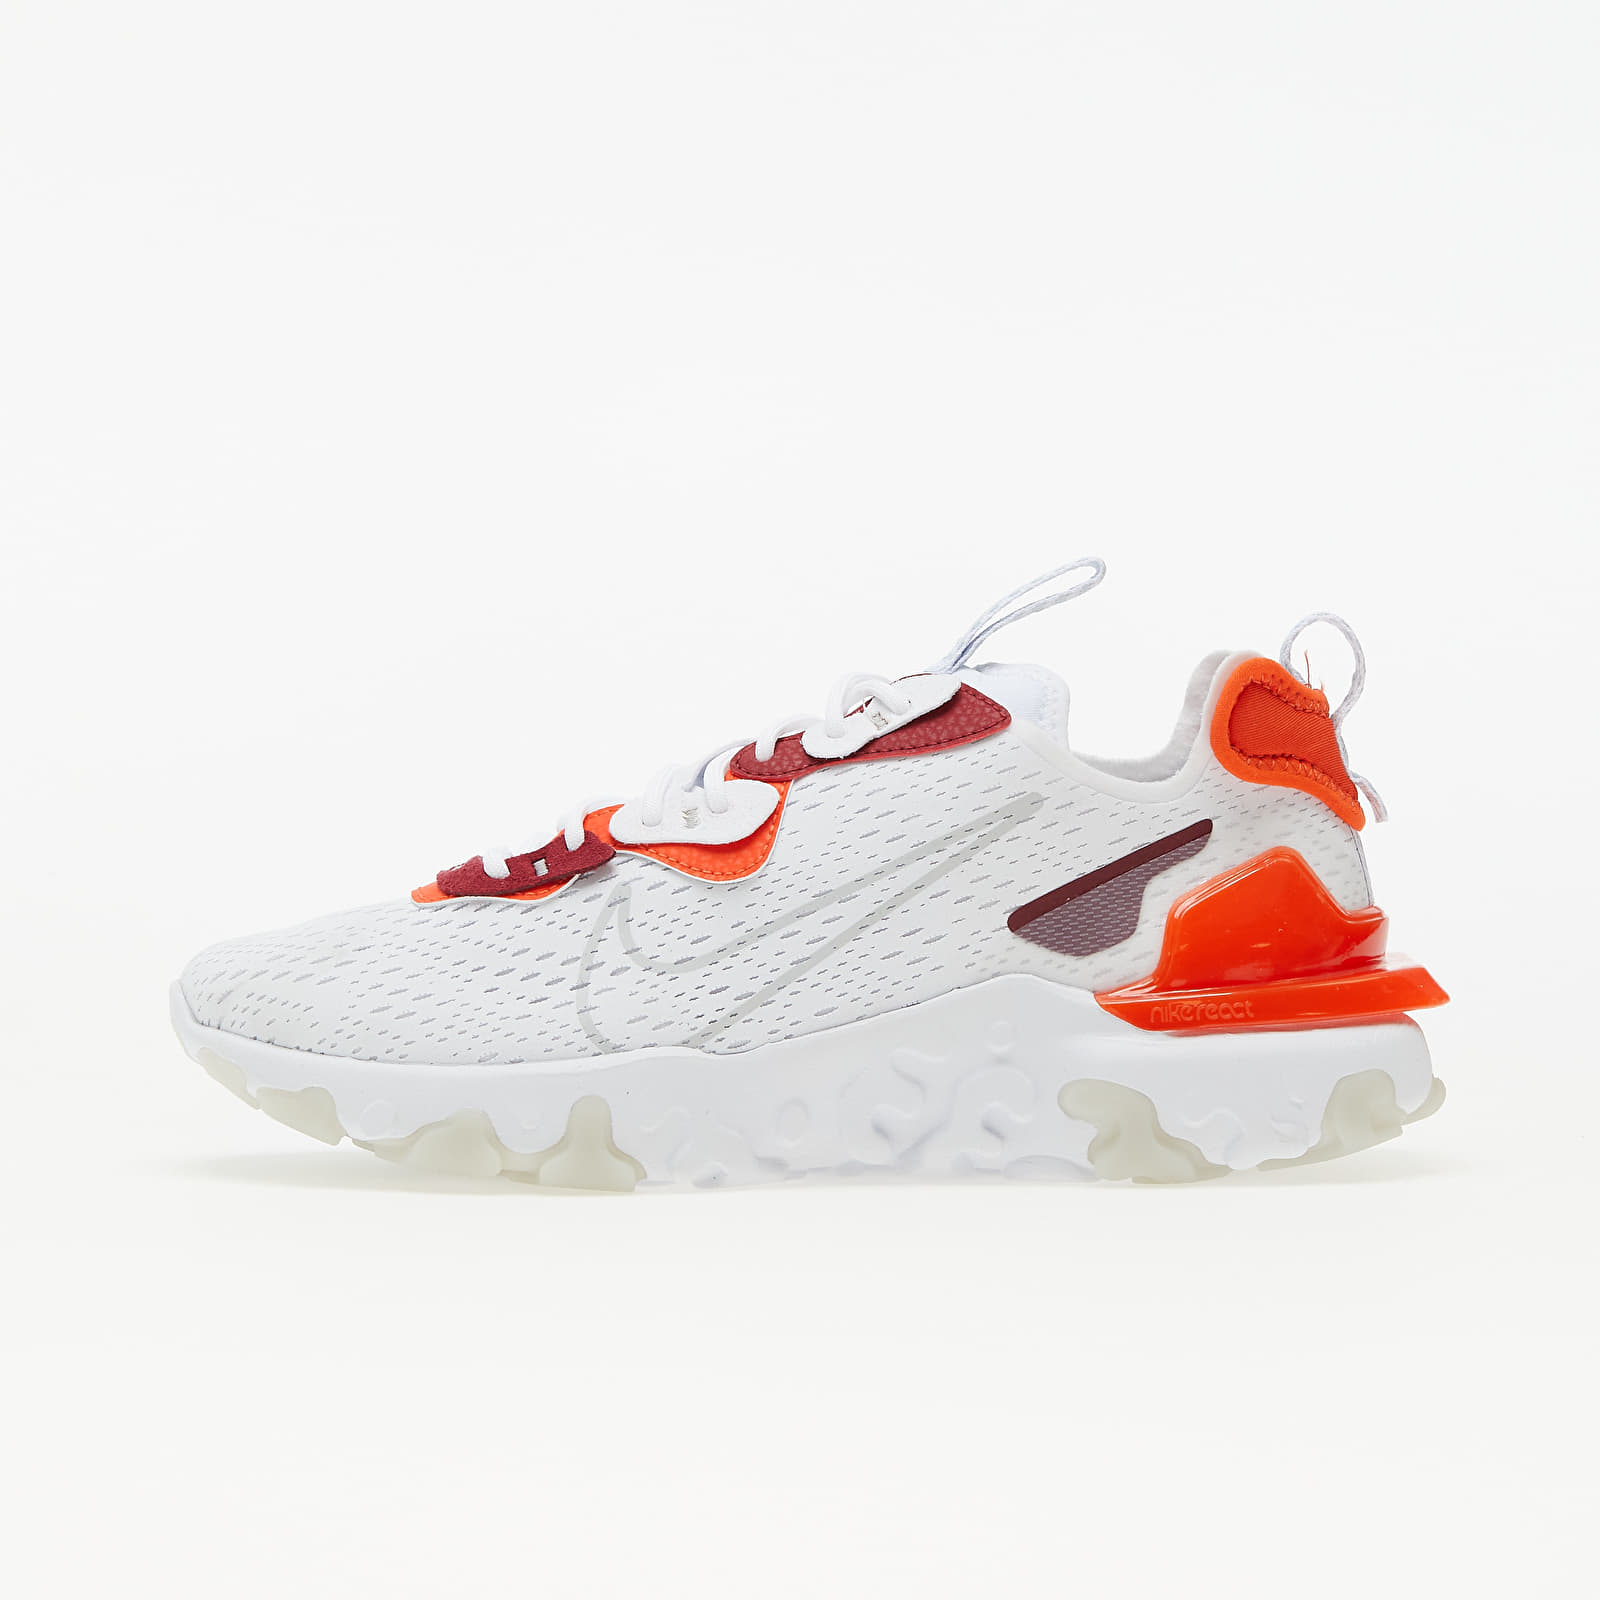 Nike React Vision White/ Lt Smoke Grey-Team Orange-Team Red | Footshop